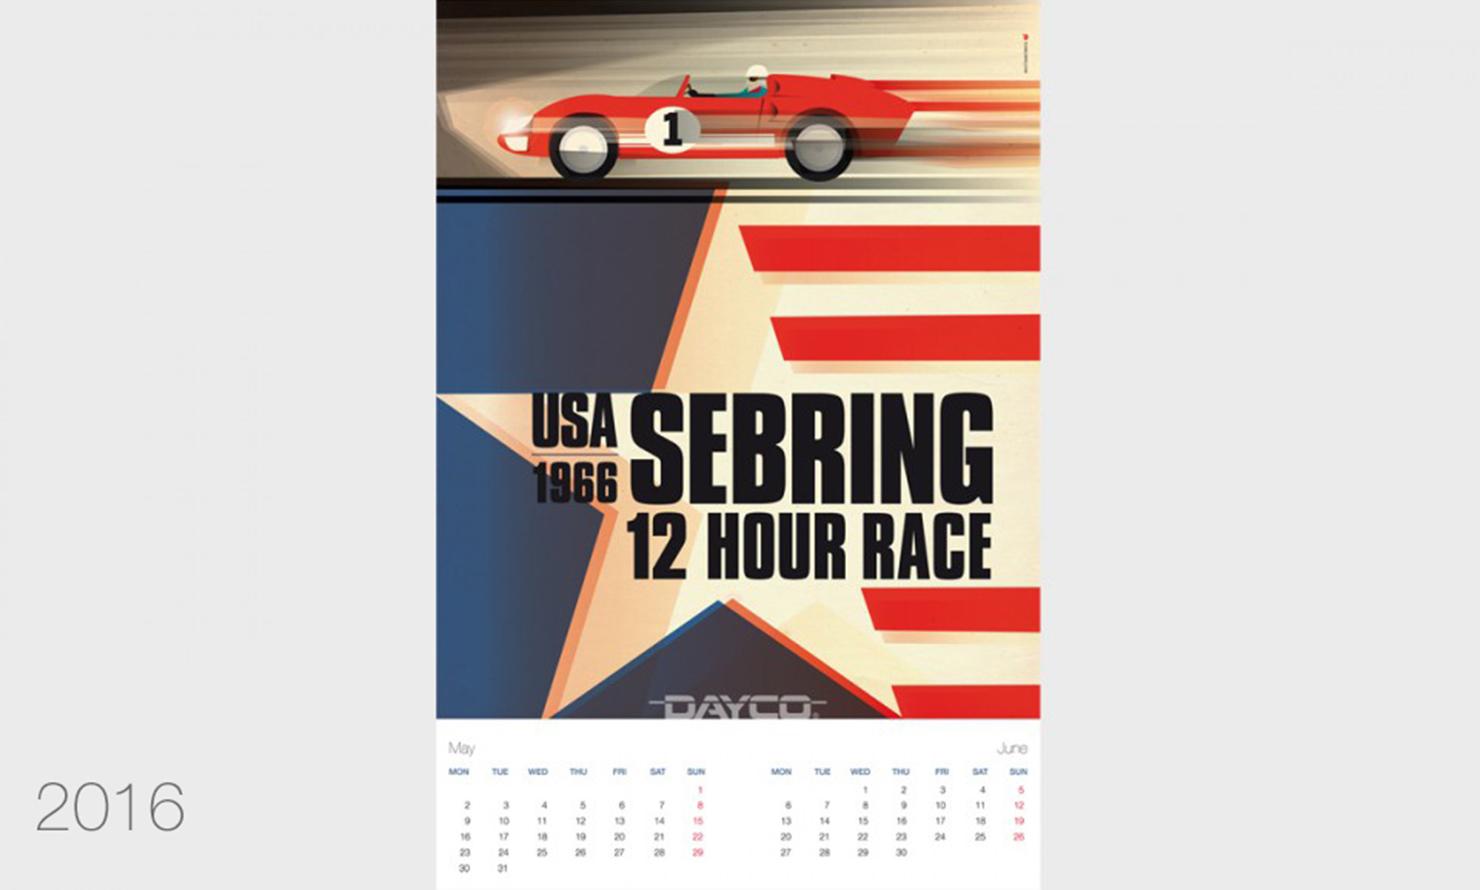 https://kubelibre.com/uploads/Slider-work-tutti-clienti/dayco-calendario-2016-3.jpg